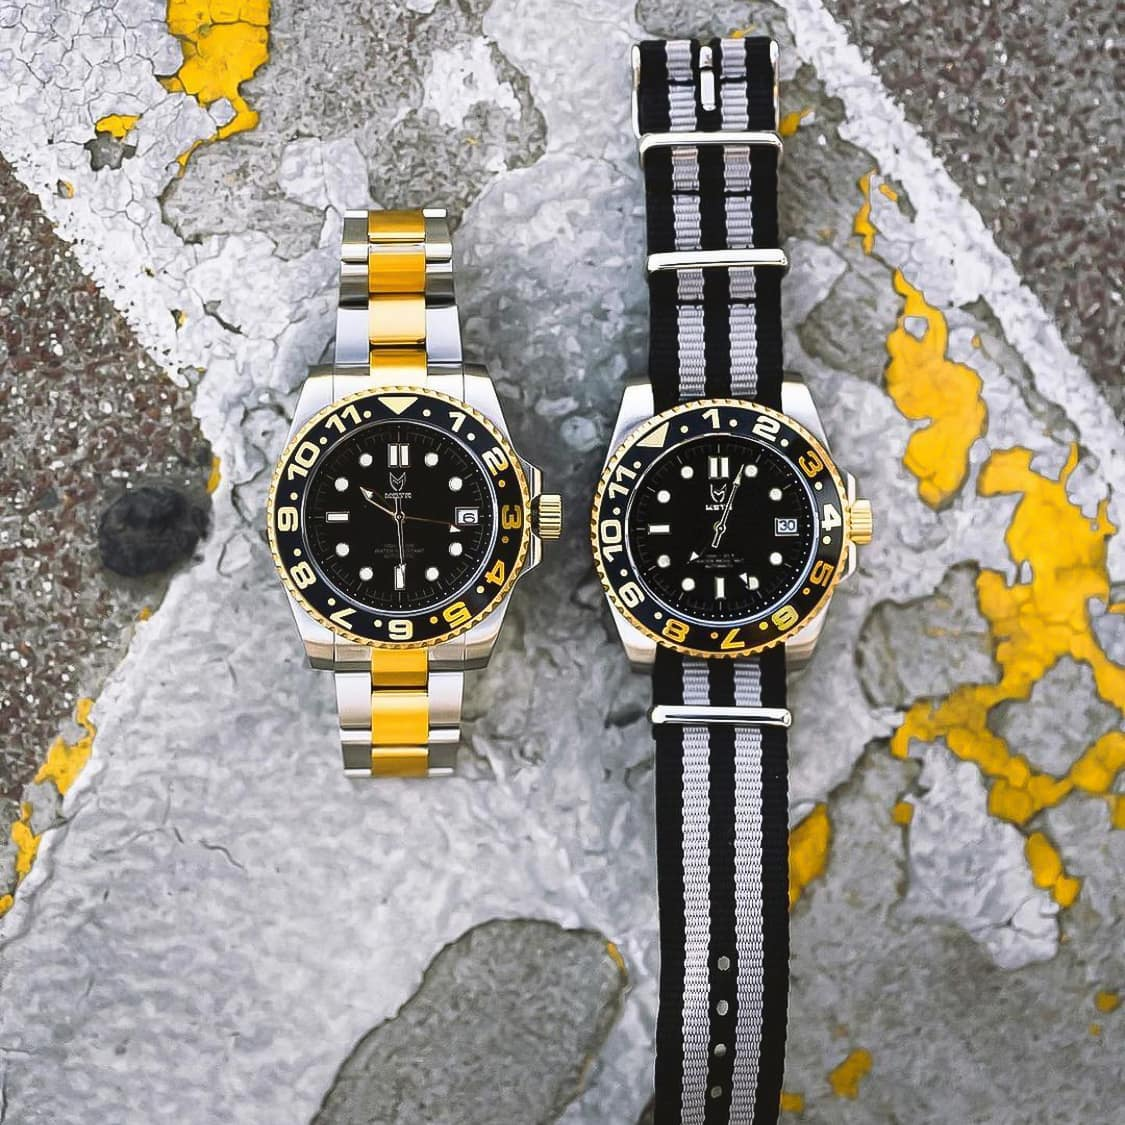 Automatic - Zilver & Goud